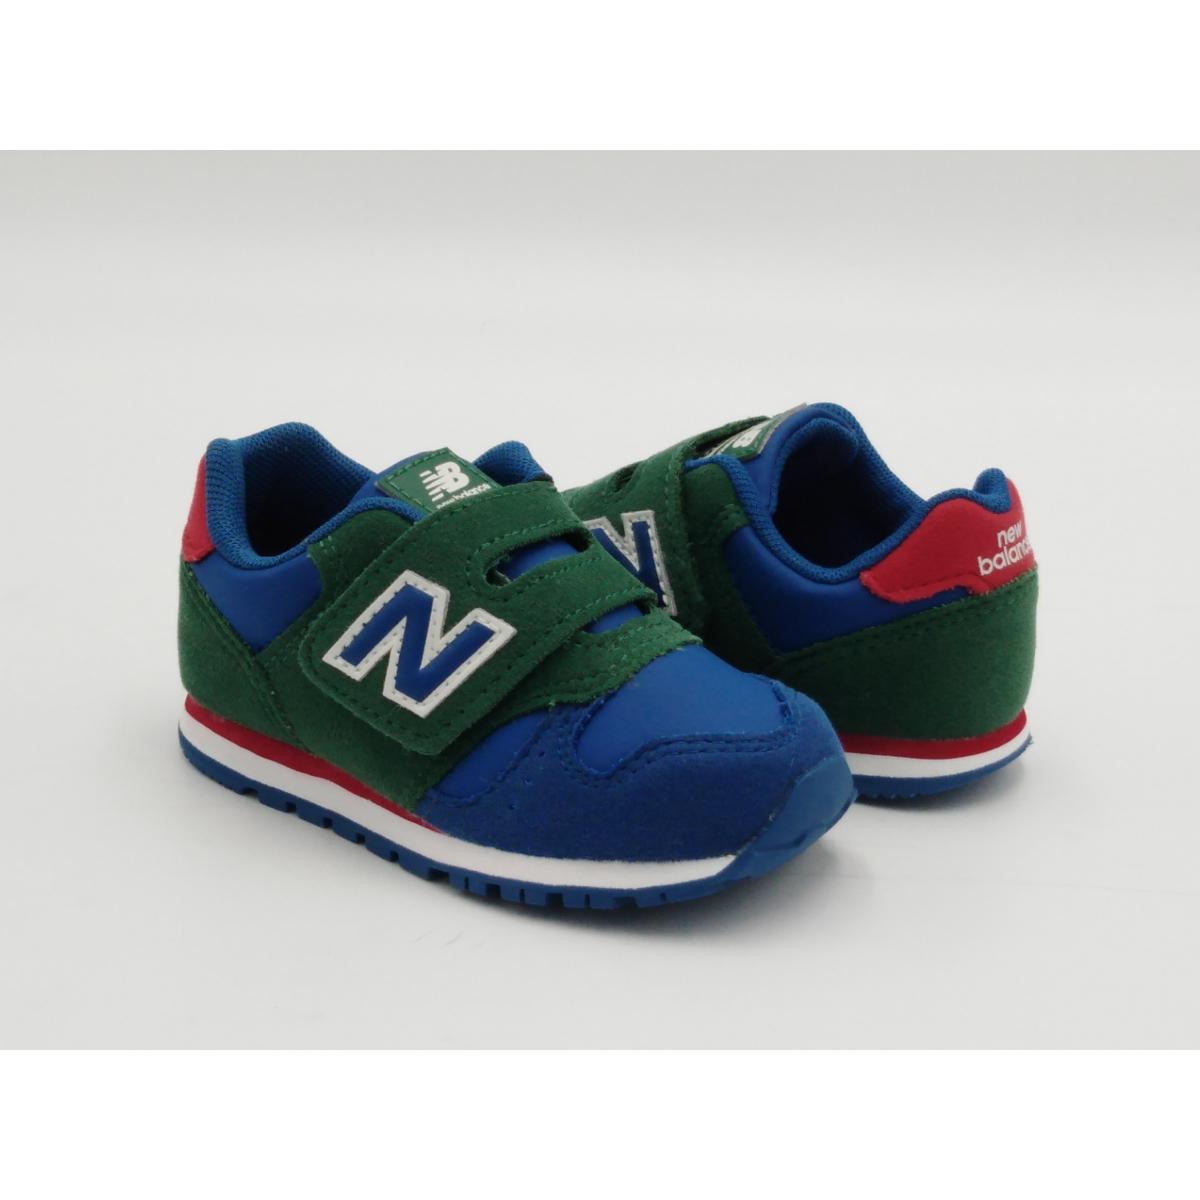 new balance 373 verde e blu